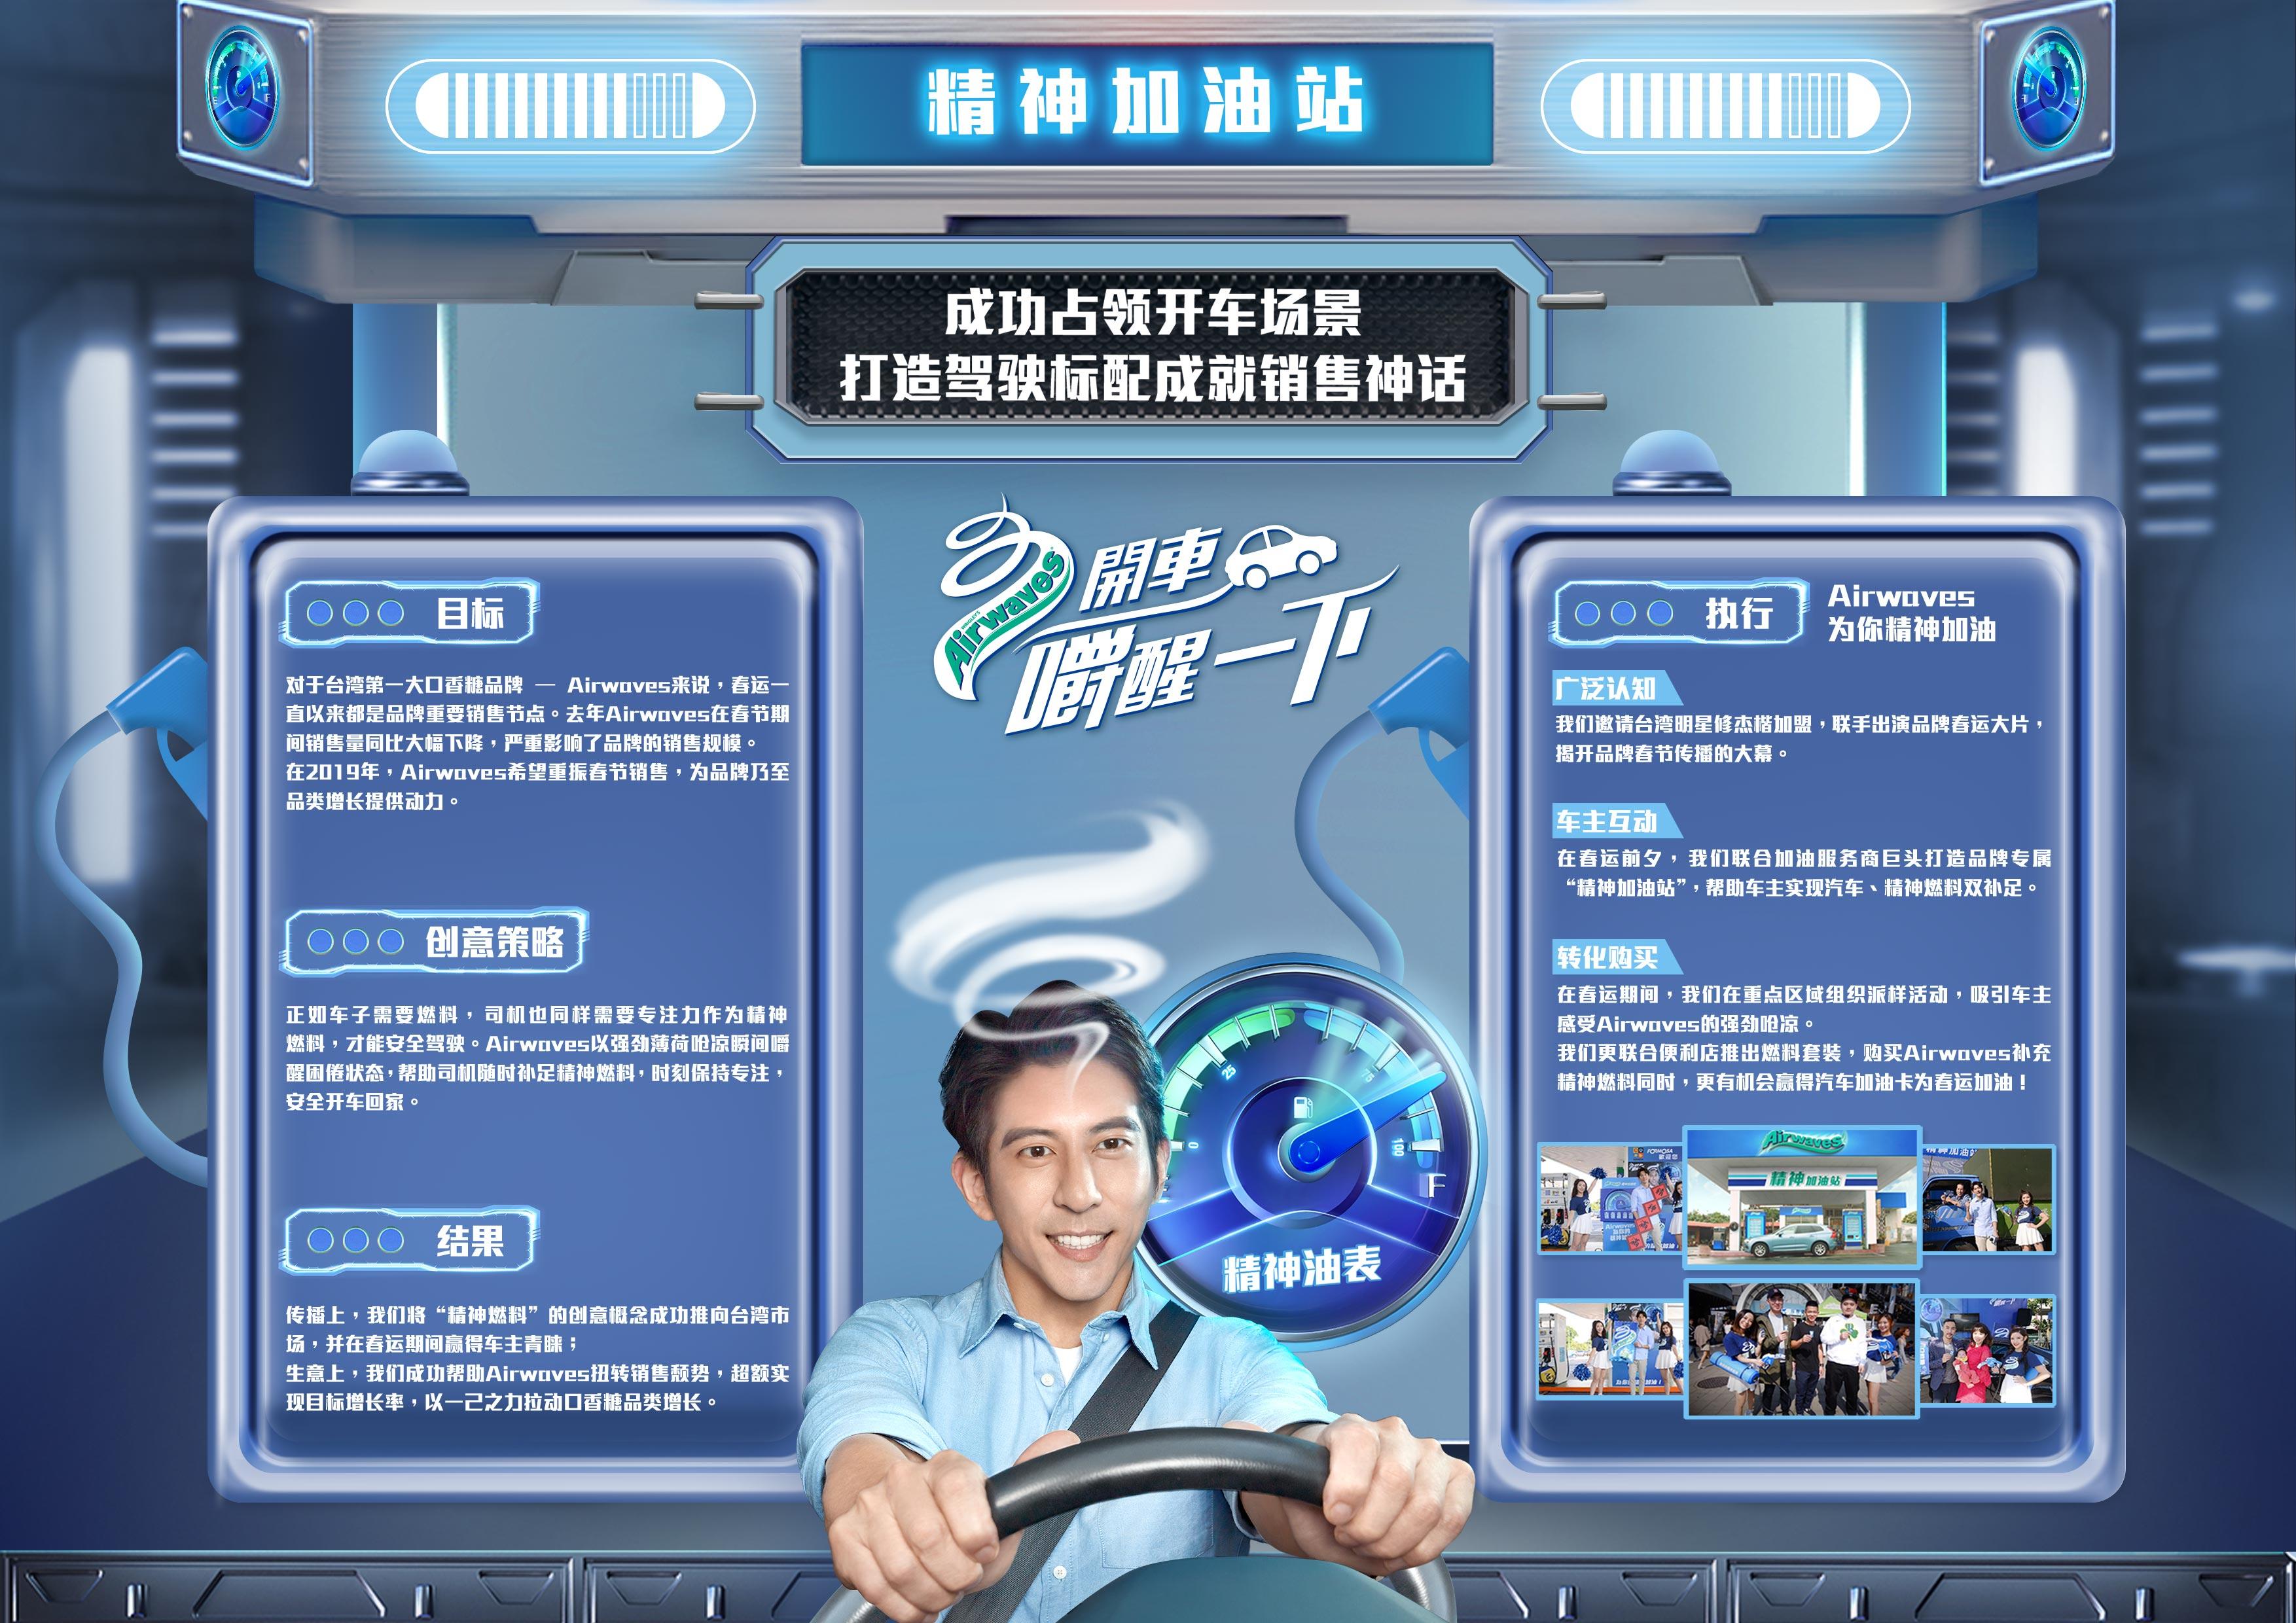 2019_cn_2019_e192-sn-163350858_hero_1